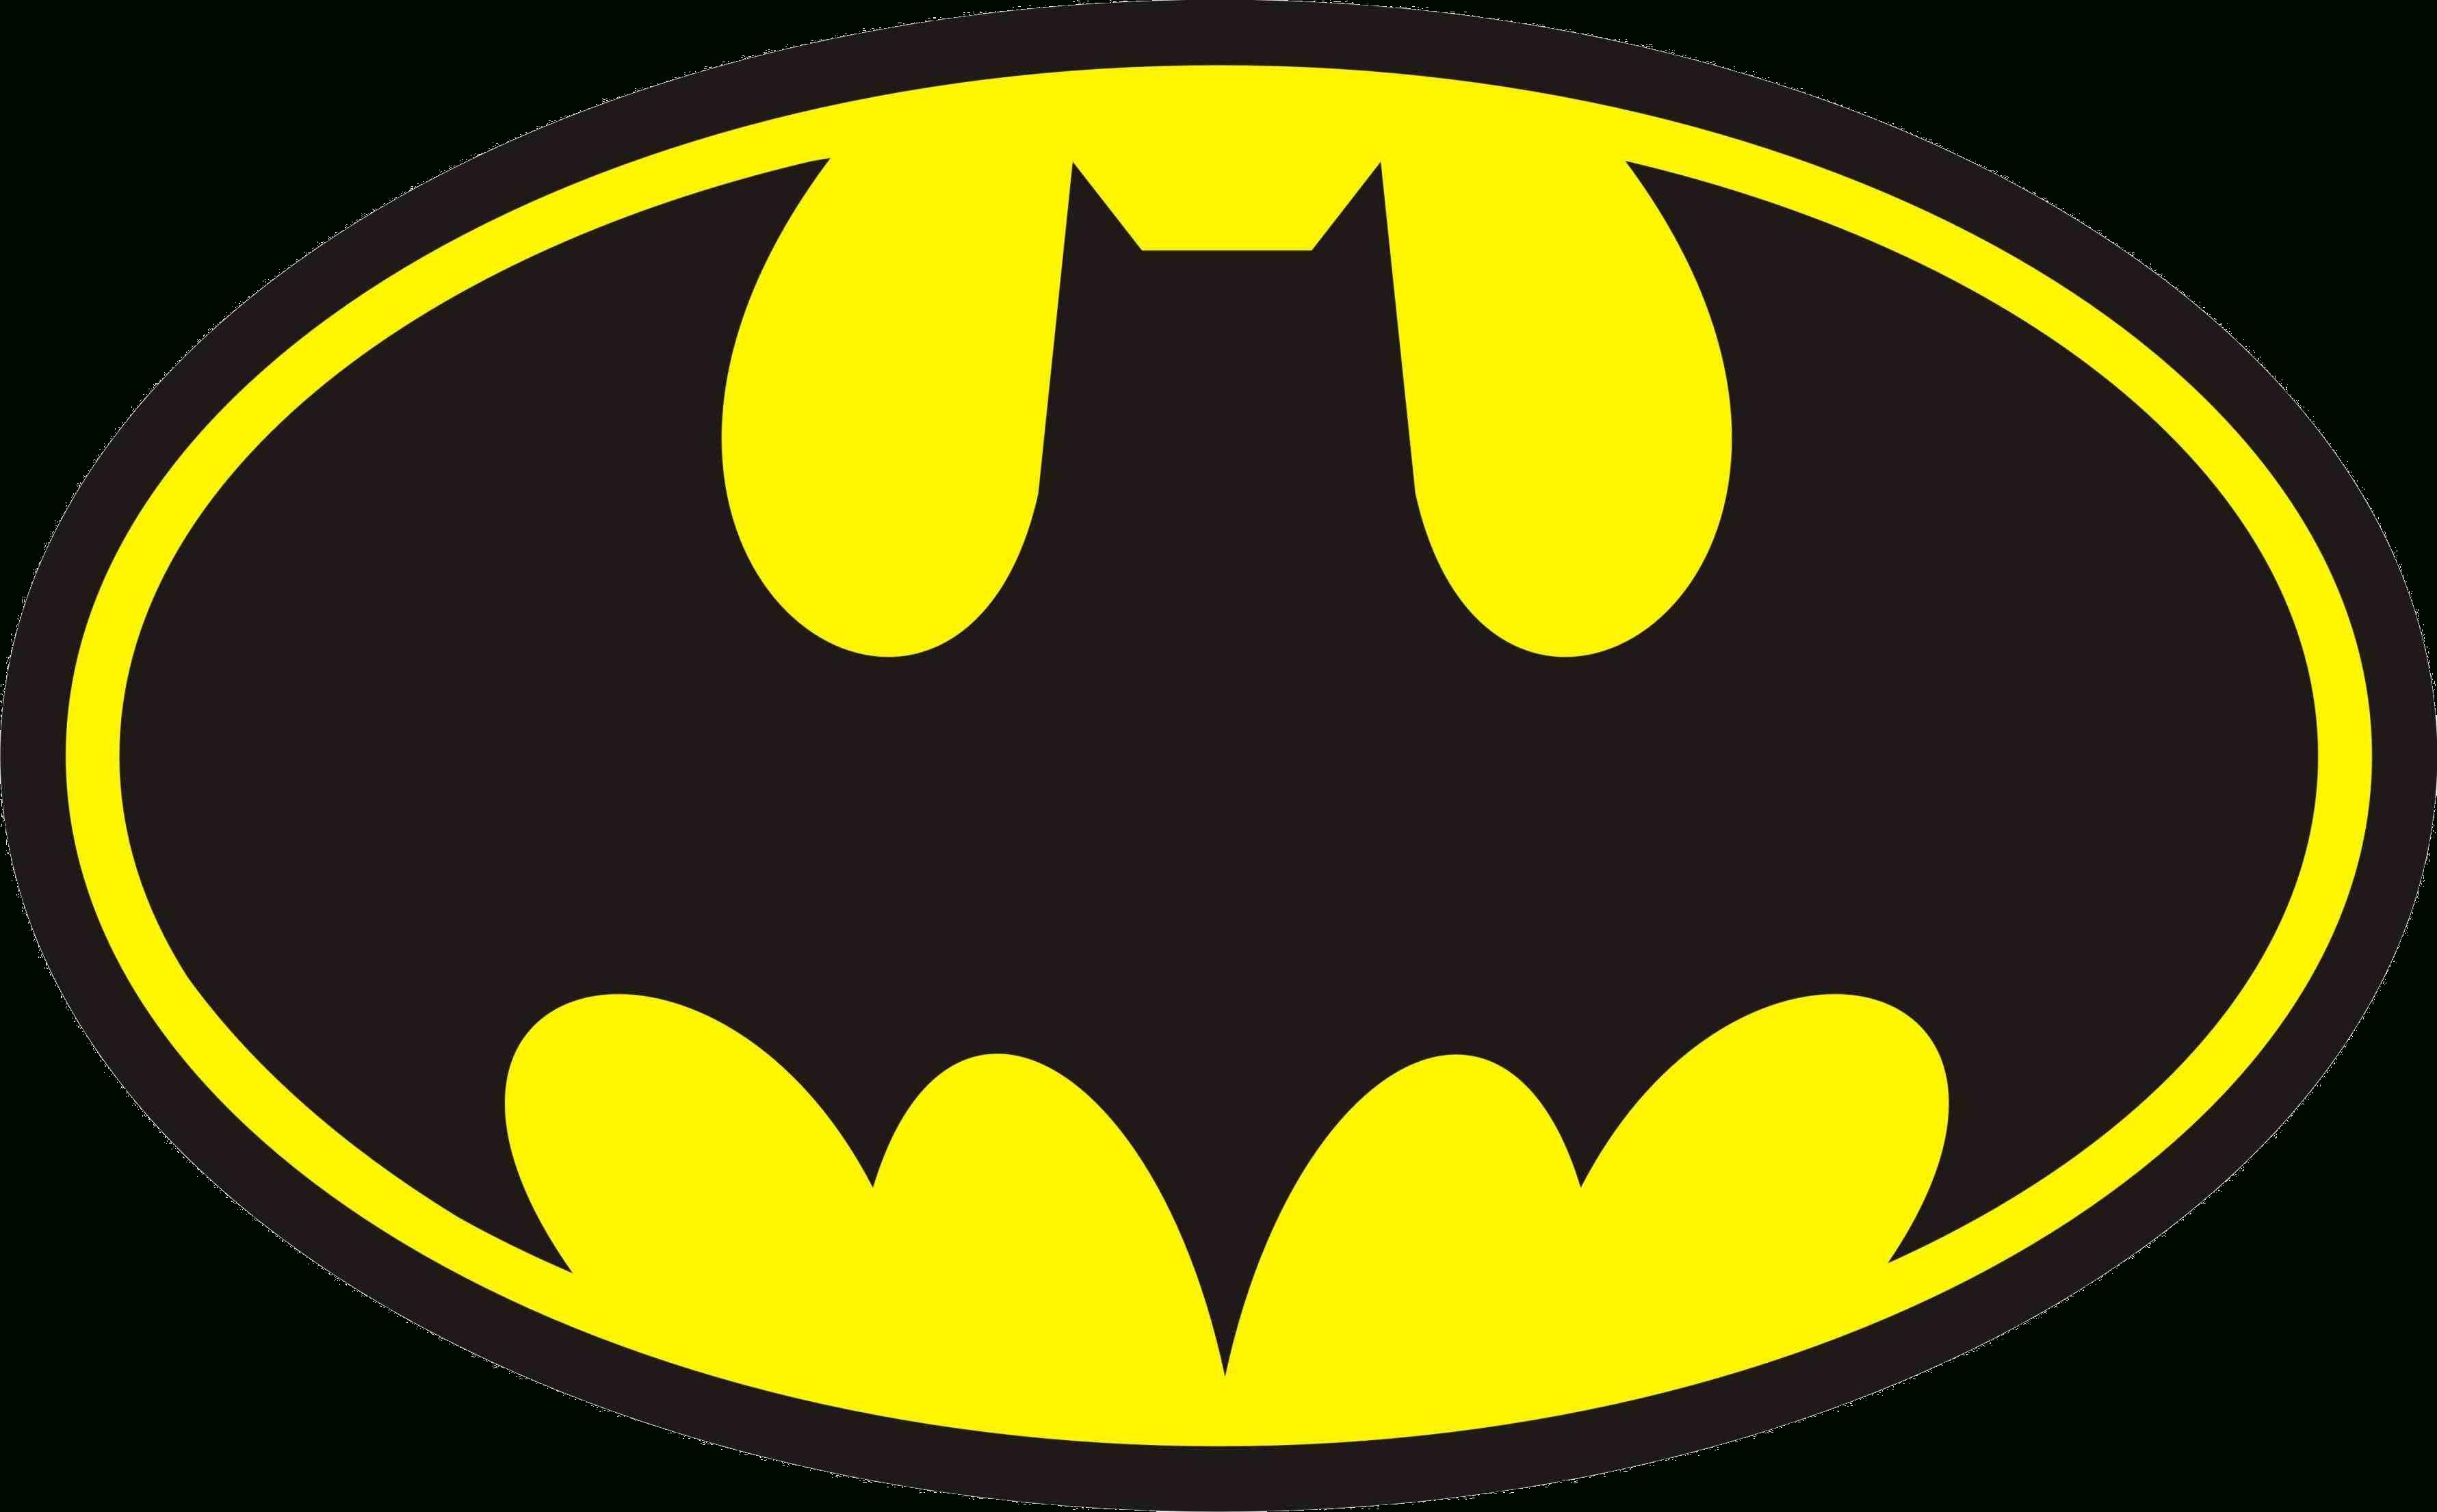 Batmam clipart jpg transparent download Batman Clipart for printable to – Free Clipart Images jpg transparent download